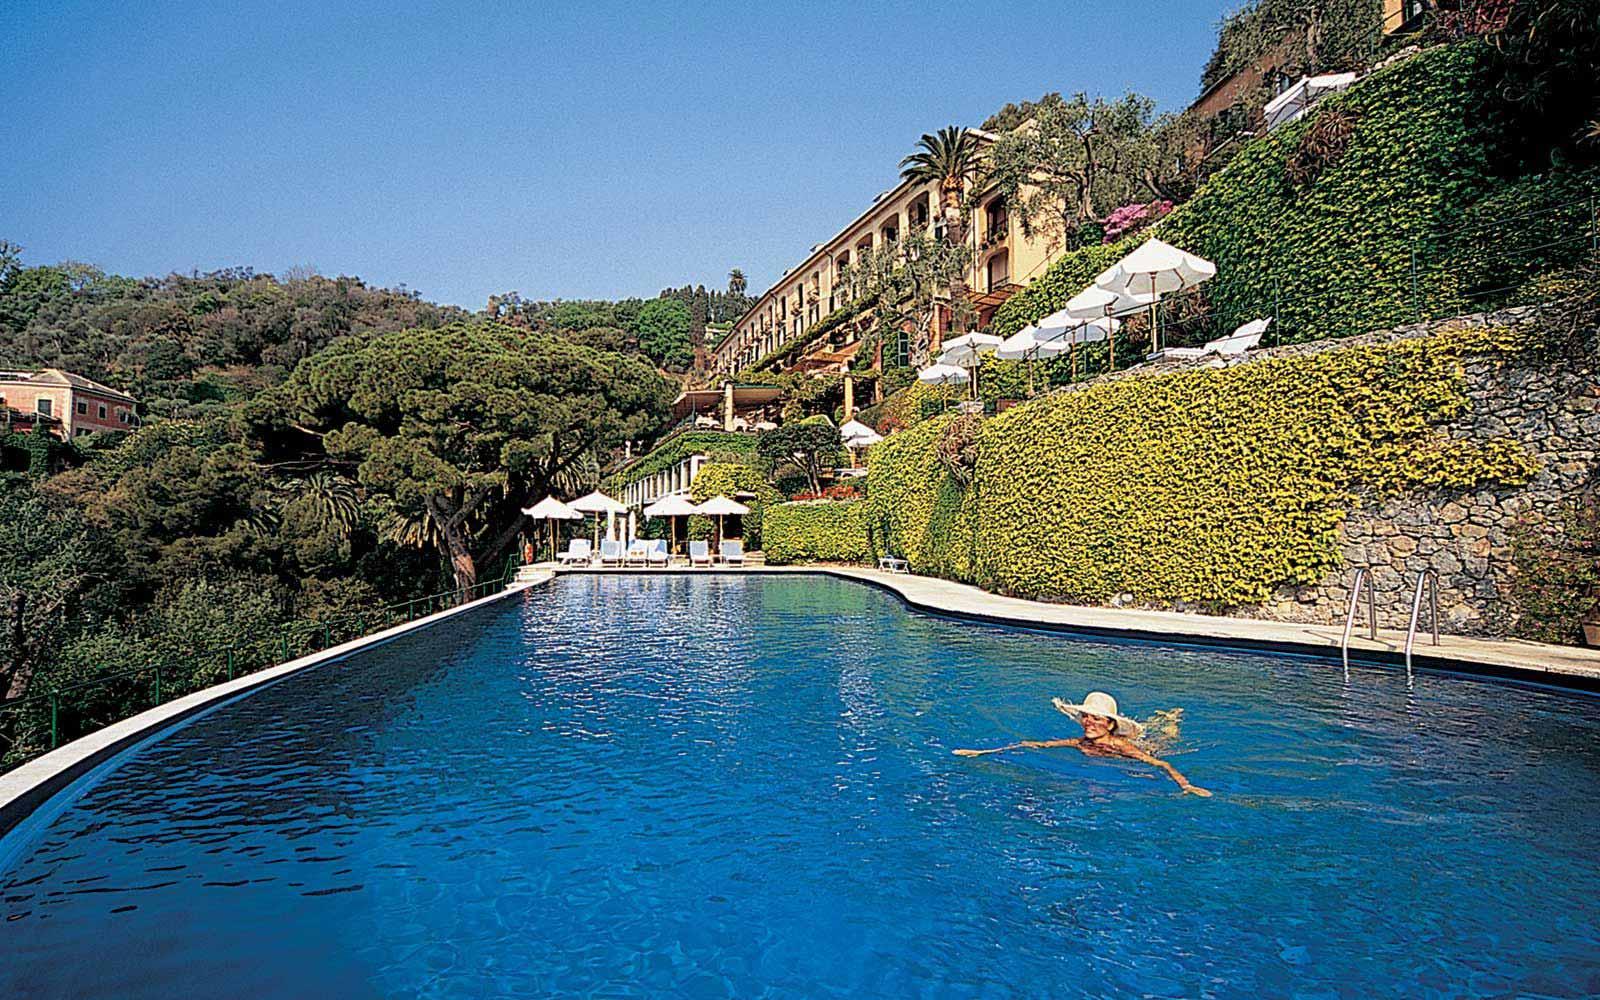 Swimming pool at Belmond Hotel Splendido & Splendido Mare